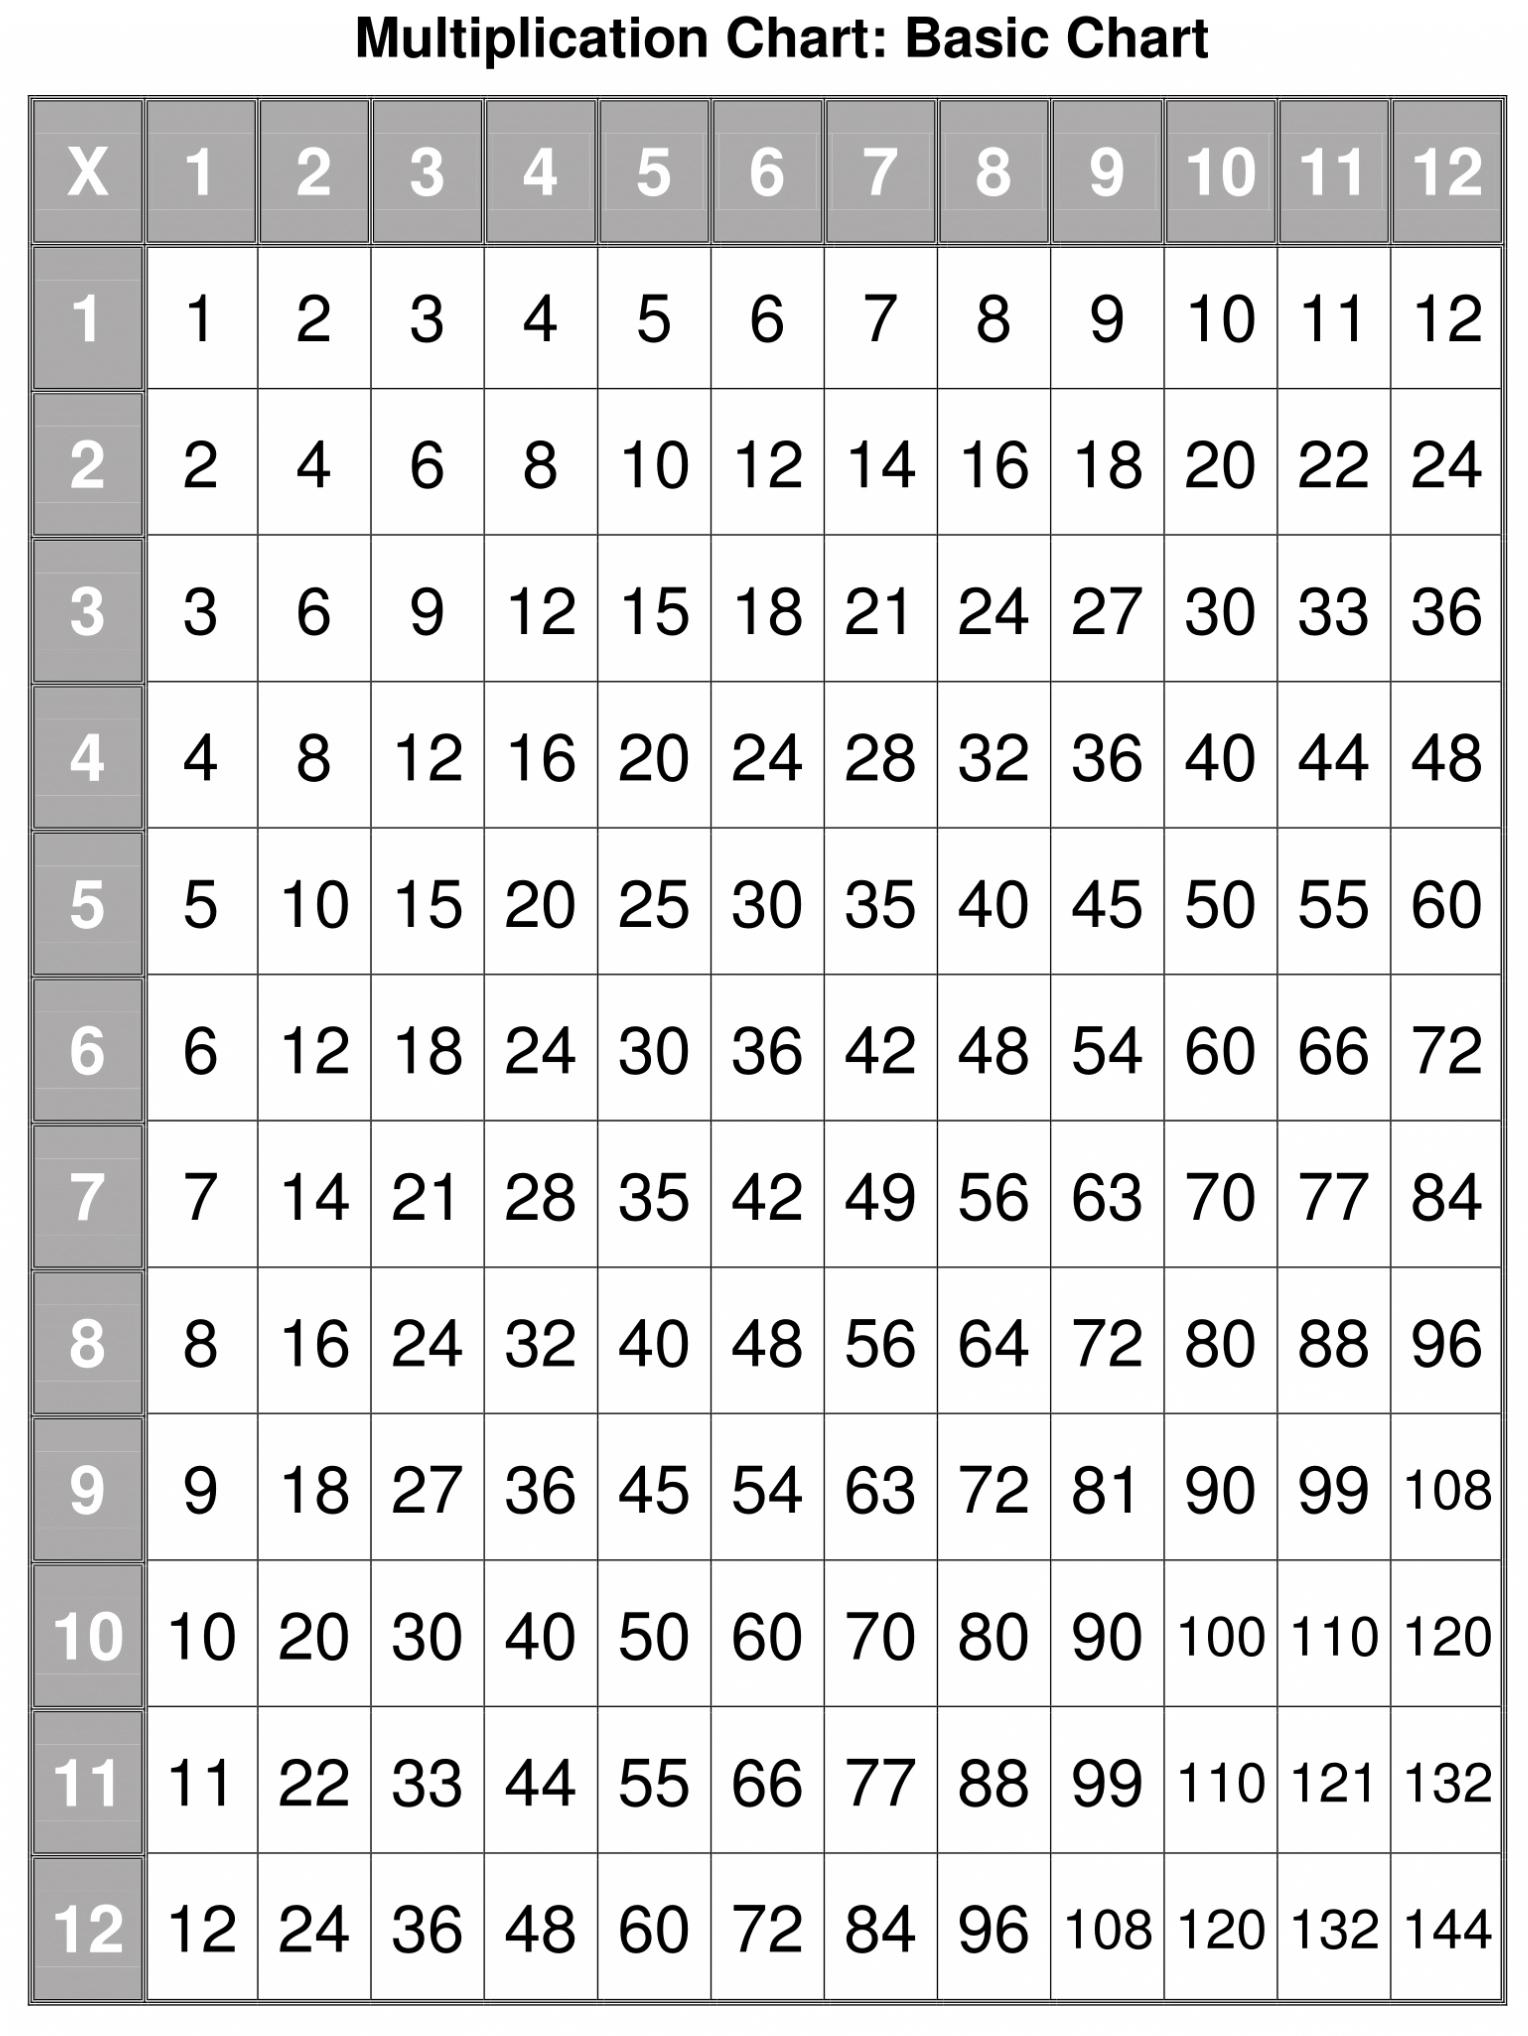 Printable Multiplication Table Pdf | Multiplication Charts within Printable Multiplication Tables 1-12